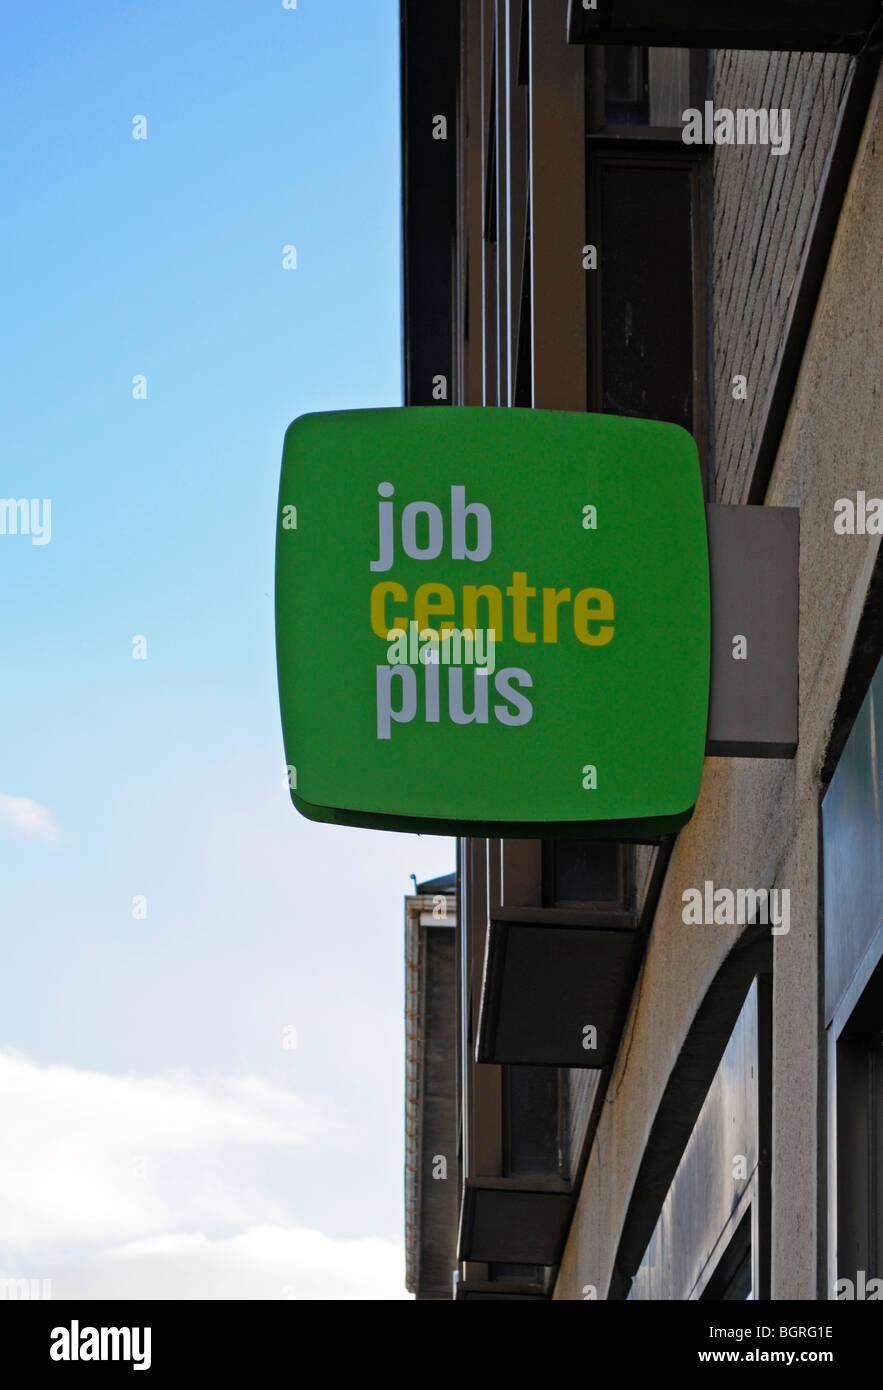 "a "" job centre plus "" sign Stock Photo"